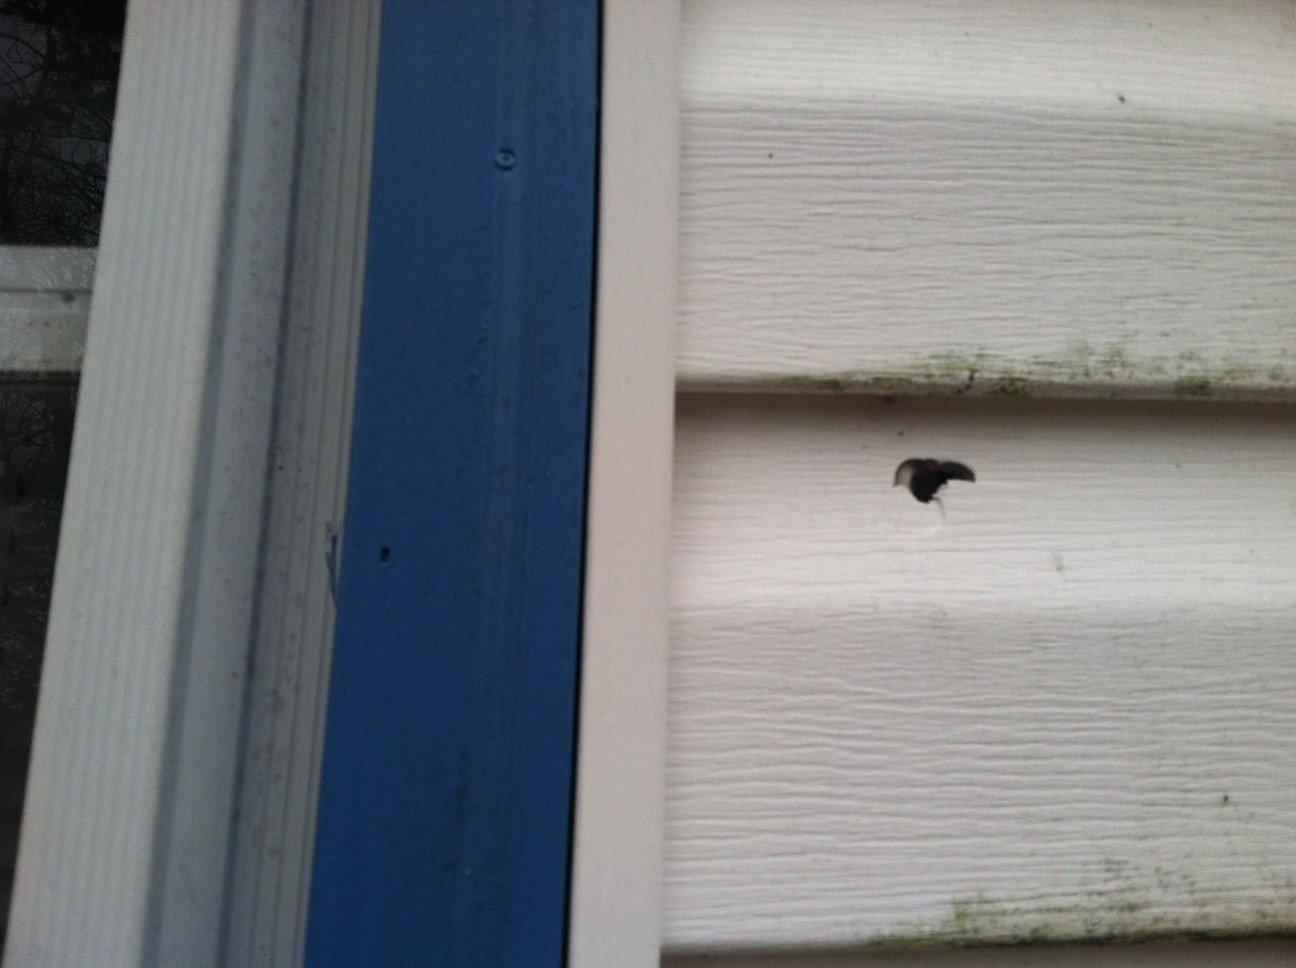 Hole shows where bullet penetrated Iva home (FOX Carolina)